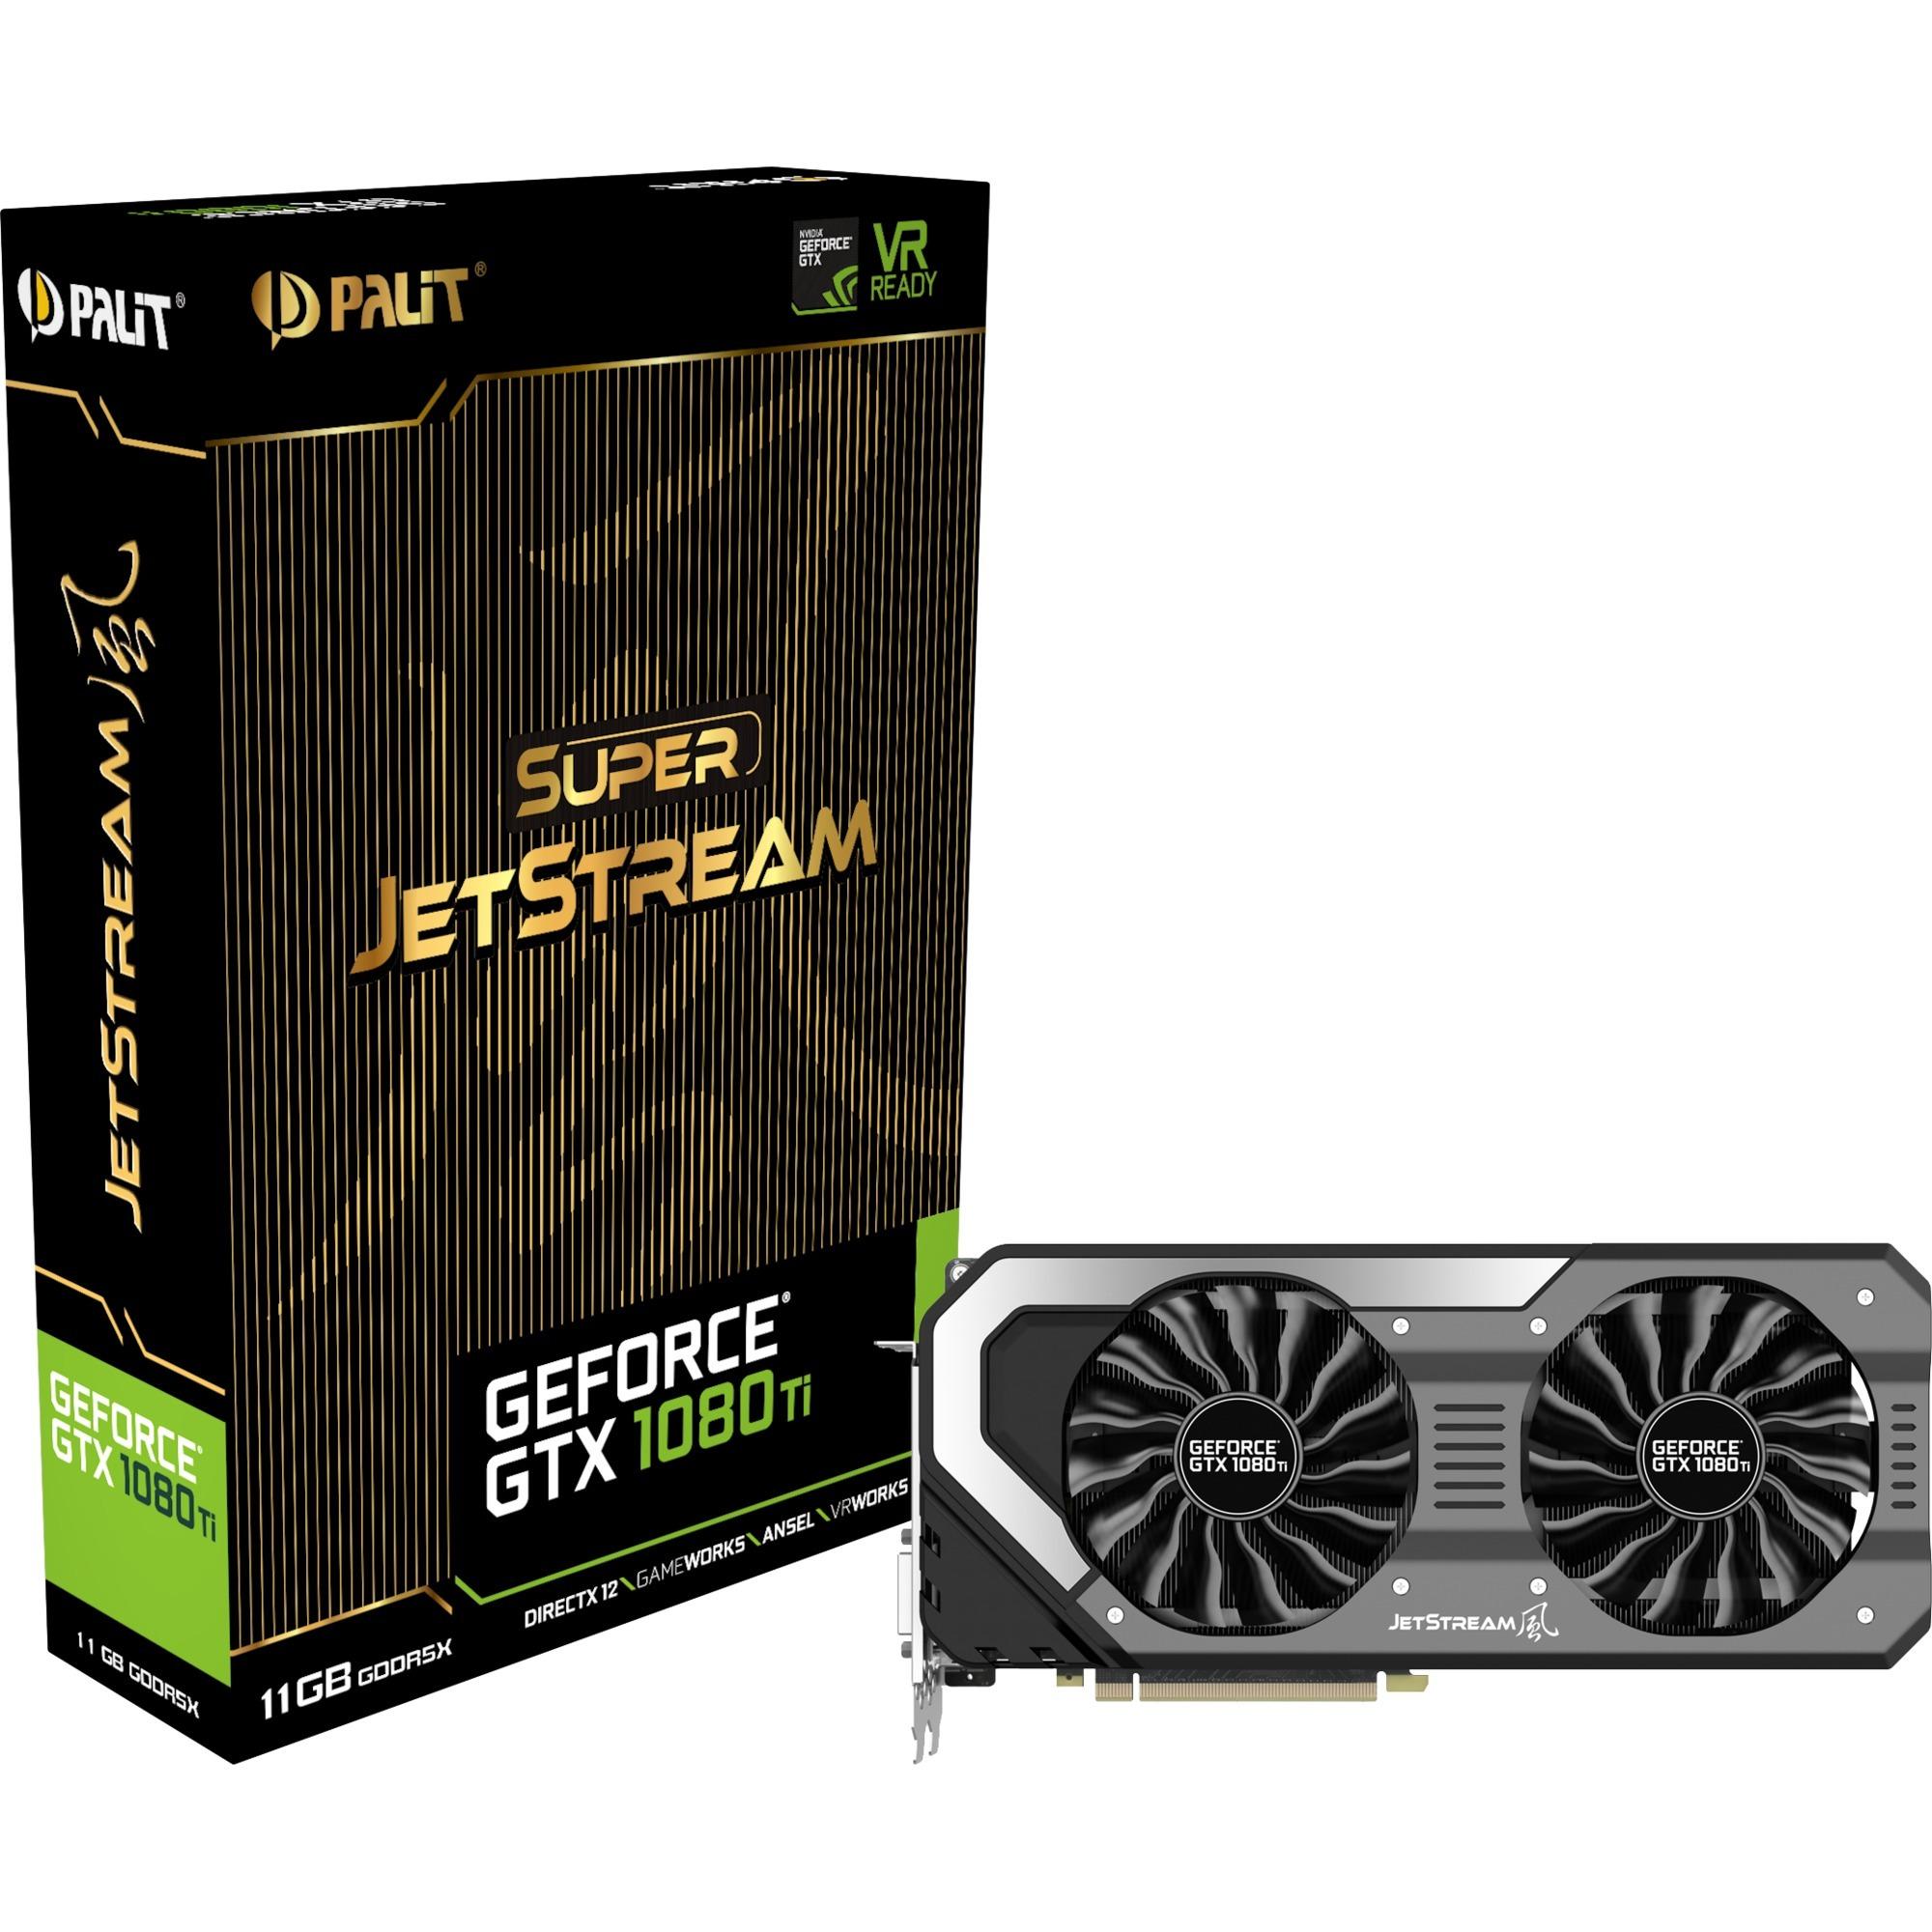 GeForce GTX 1080 Ti Super Jetstream, Tarjeta gráfica